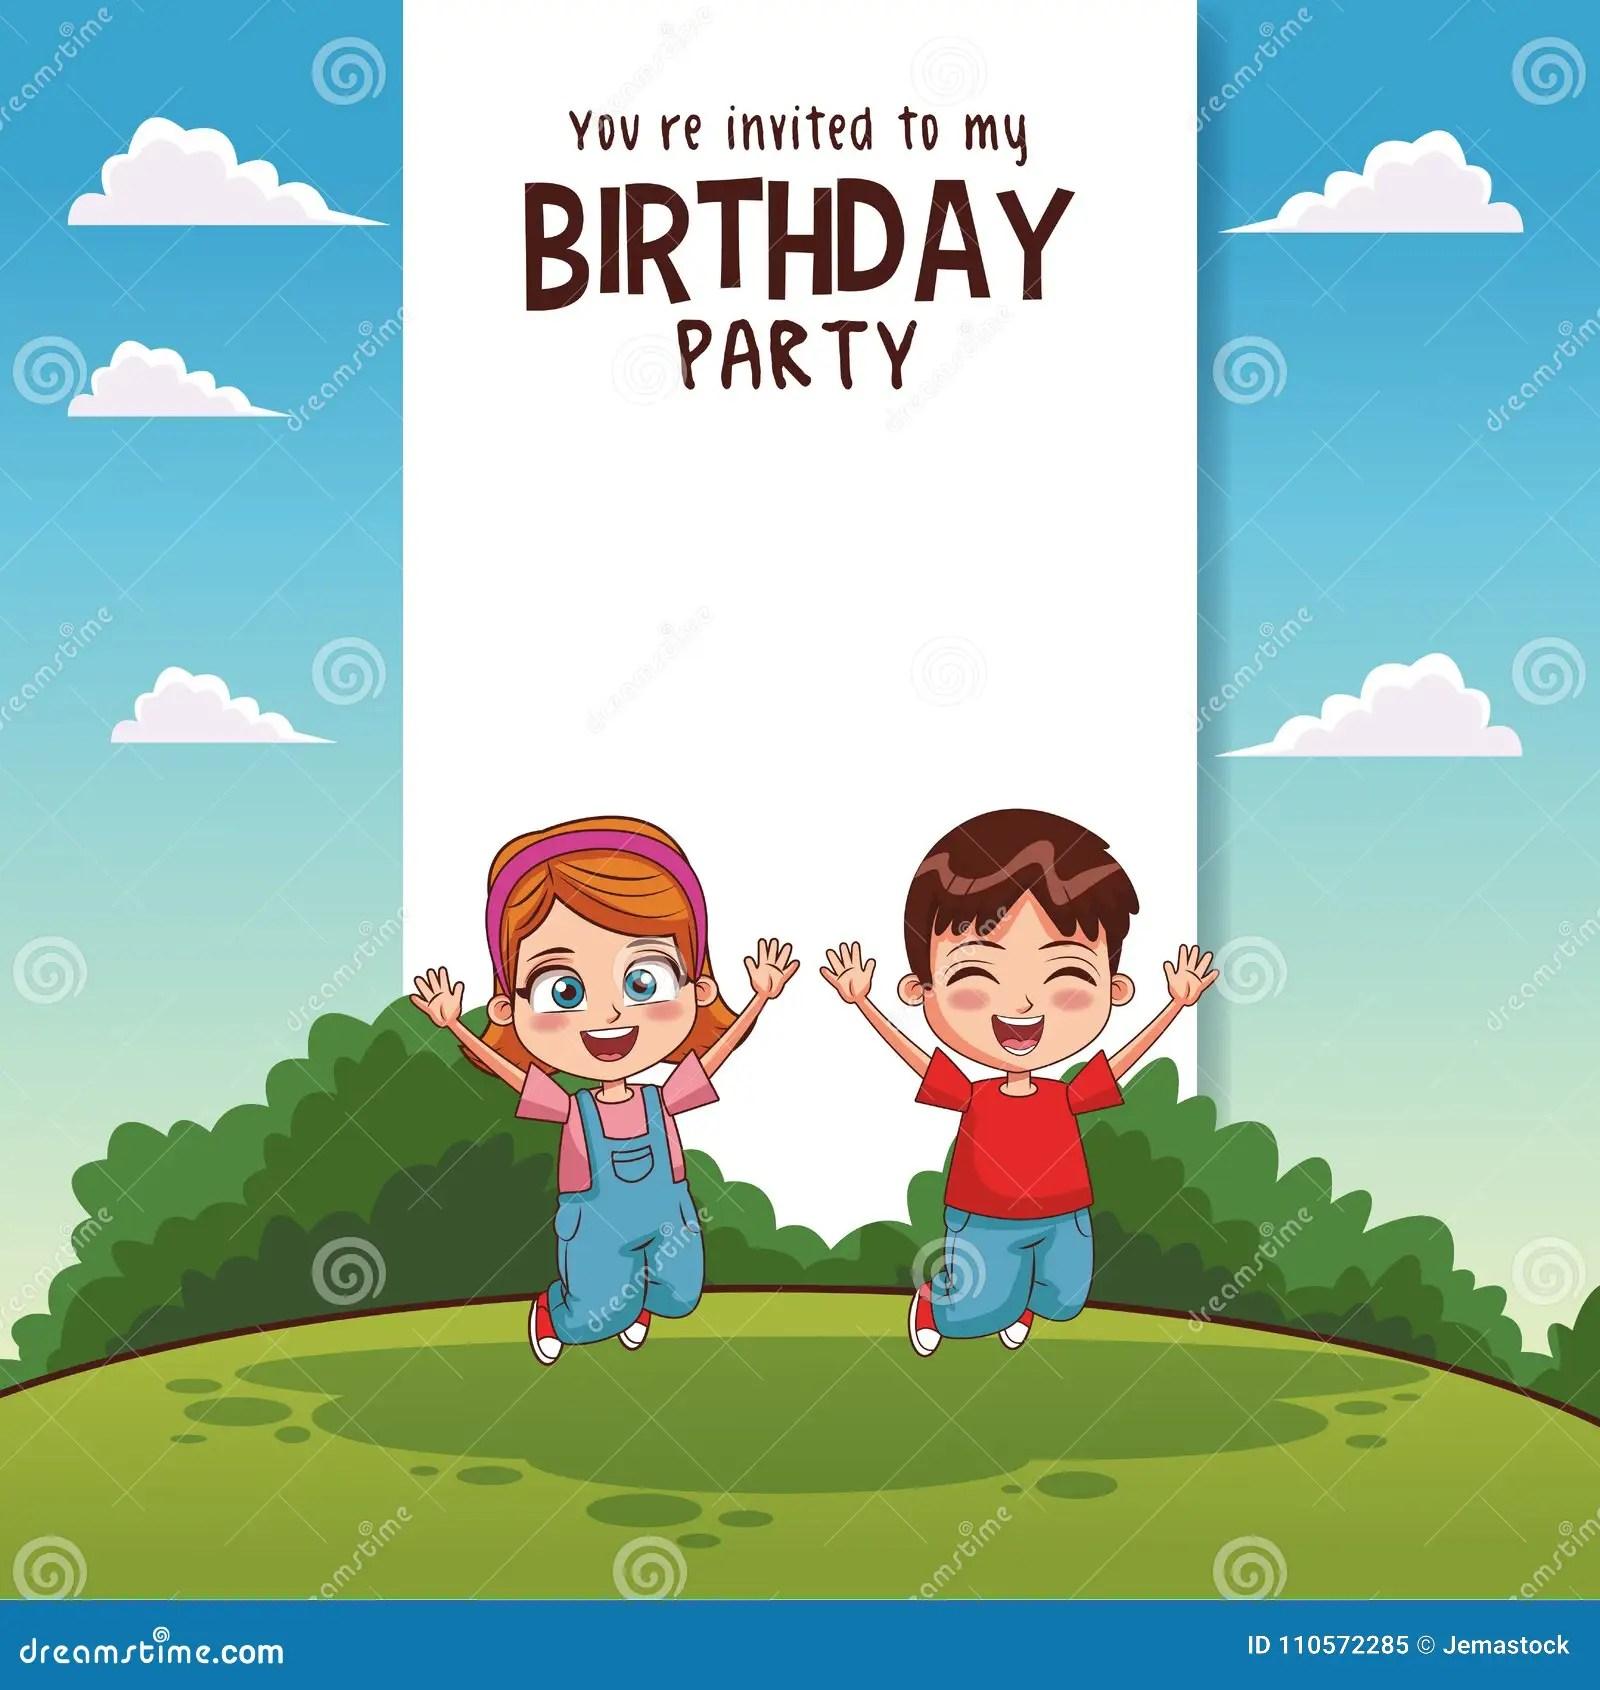 https www dreamstime com kids birthday party card invitation kids birthday party card invitation vector illustration graphic design image110572285